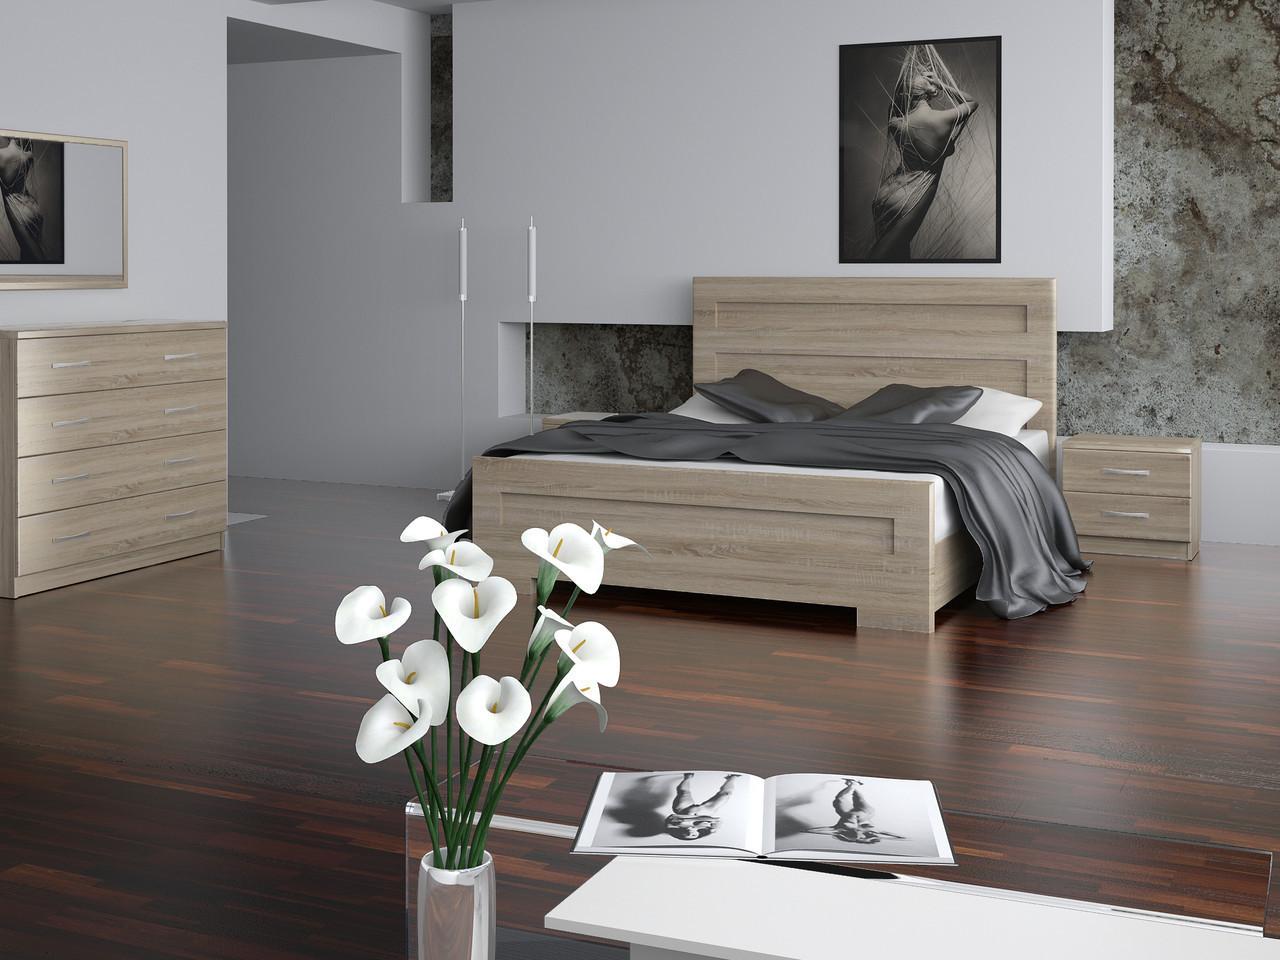 Кровать Кармен 1,6 м дуб сонома